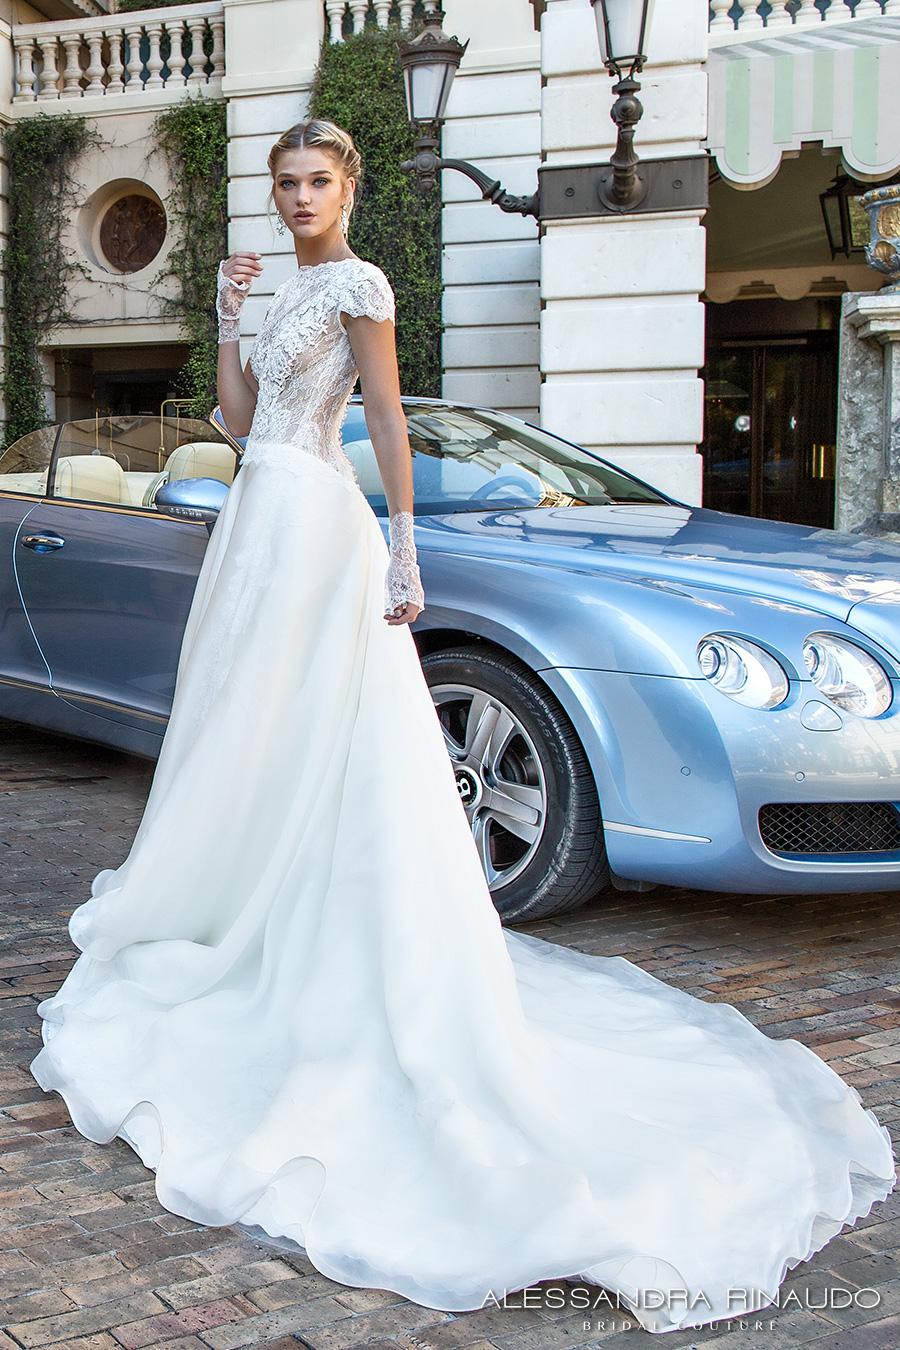 Alessandra Rinaudo 2017 Wedding Dresses Gorgeous Italian Bridal Couture Wedding Inspirasi